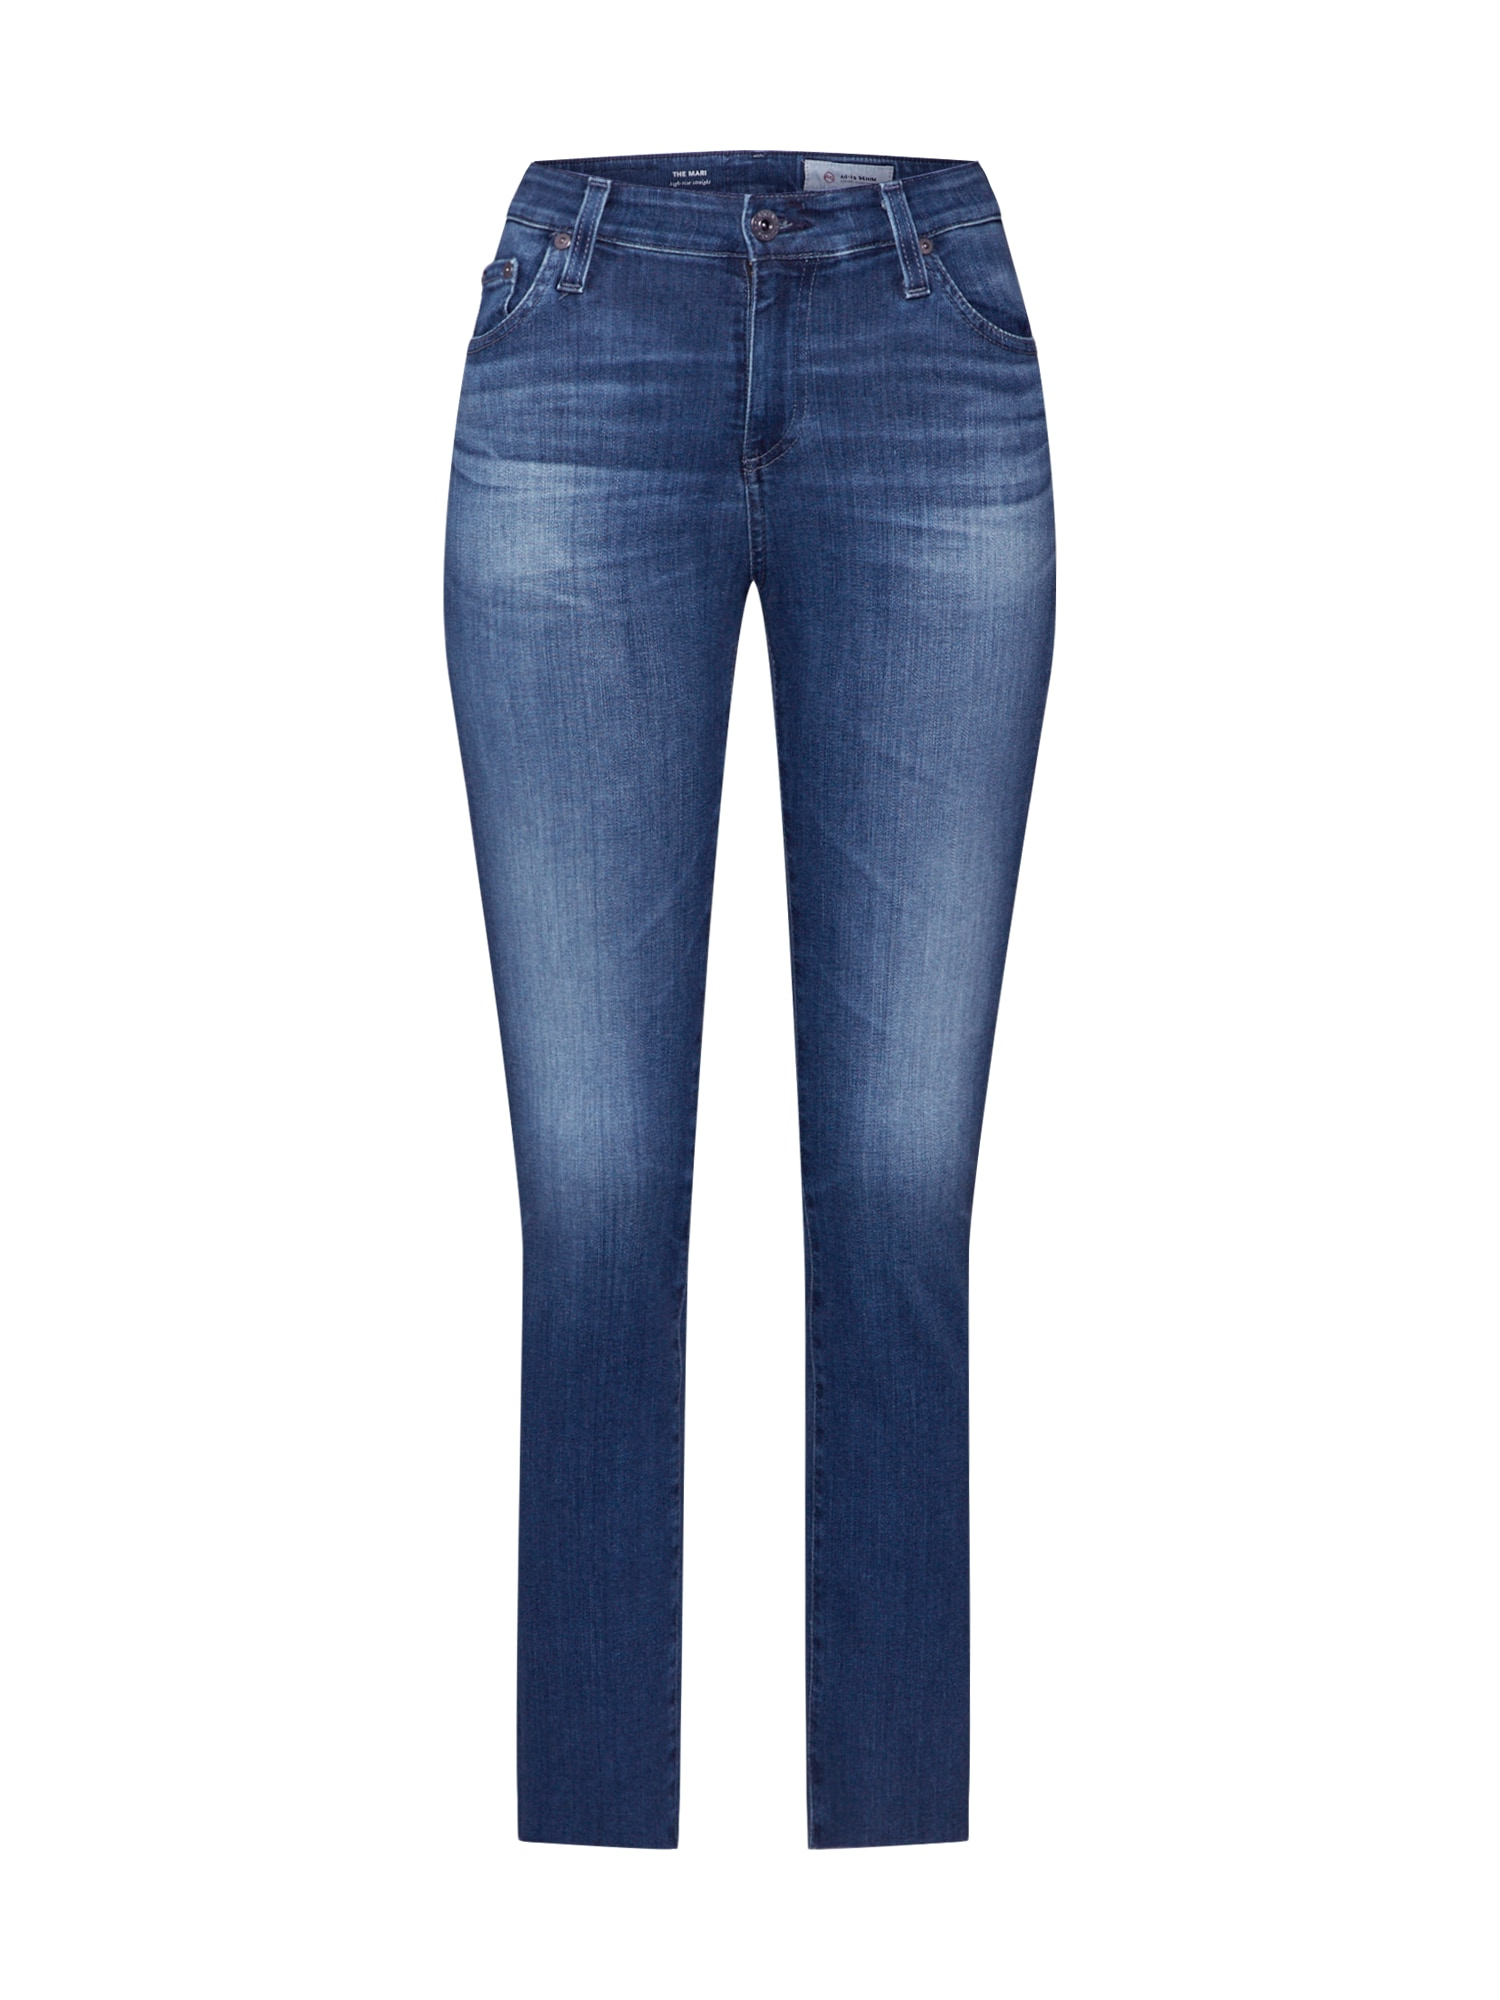 AG Jeans Džinsai 'MARI' tamsiai (džinso) mėlyna